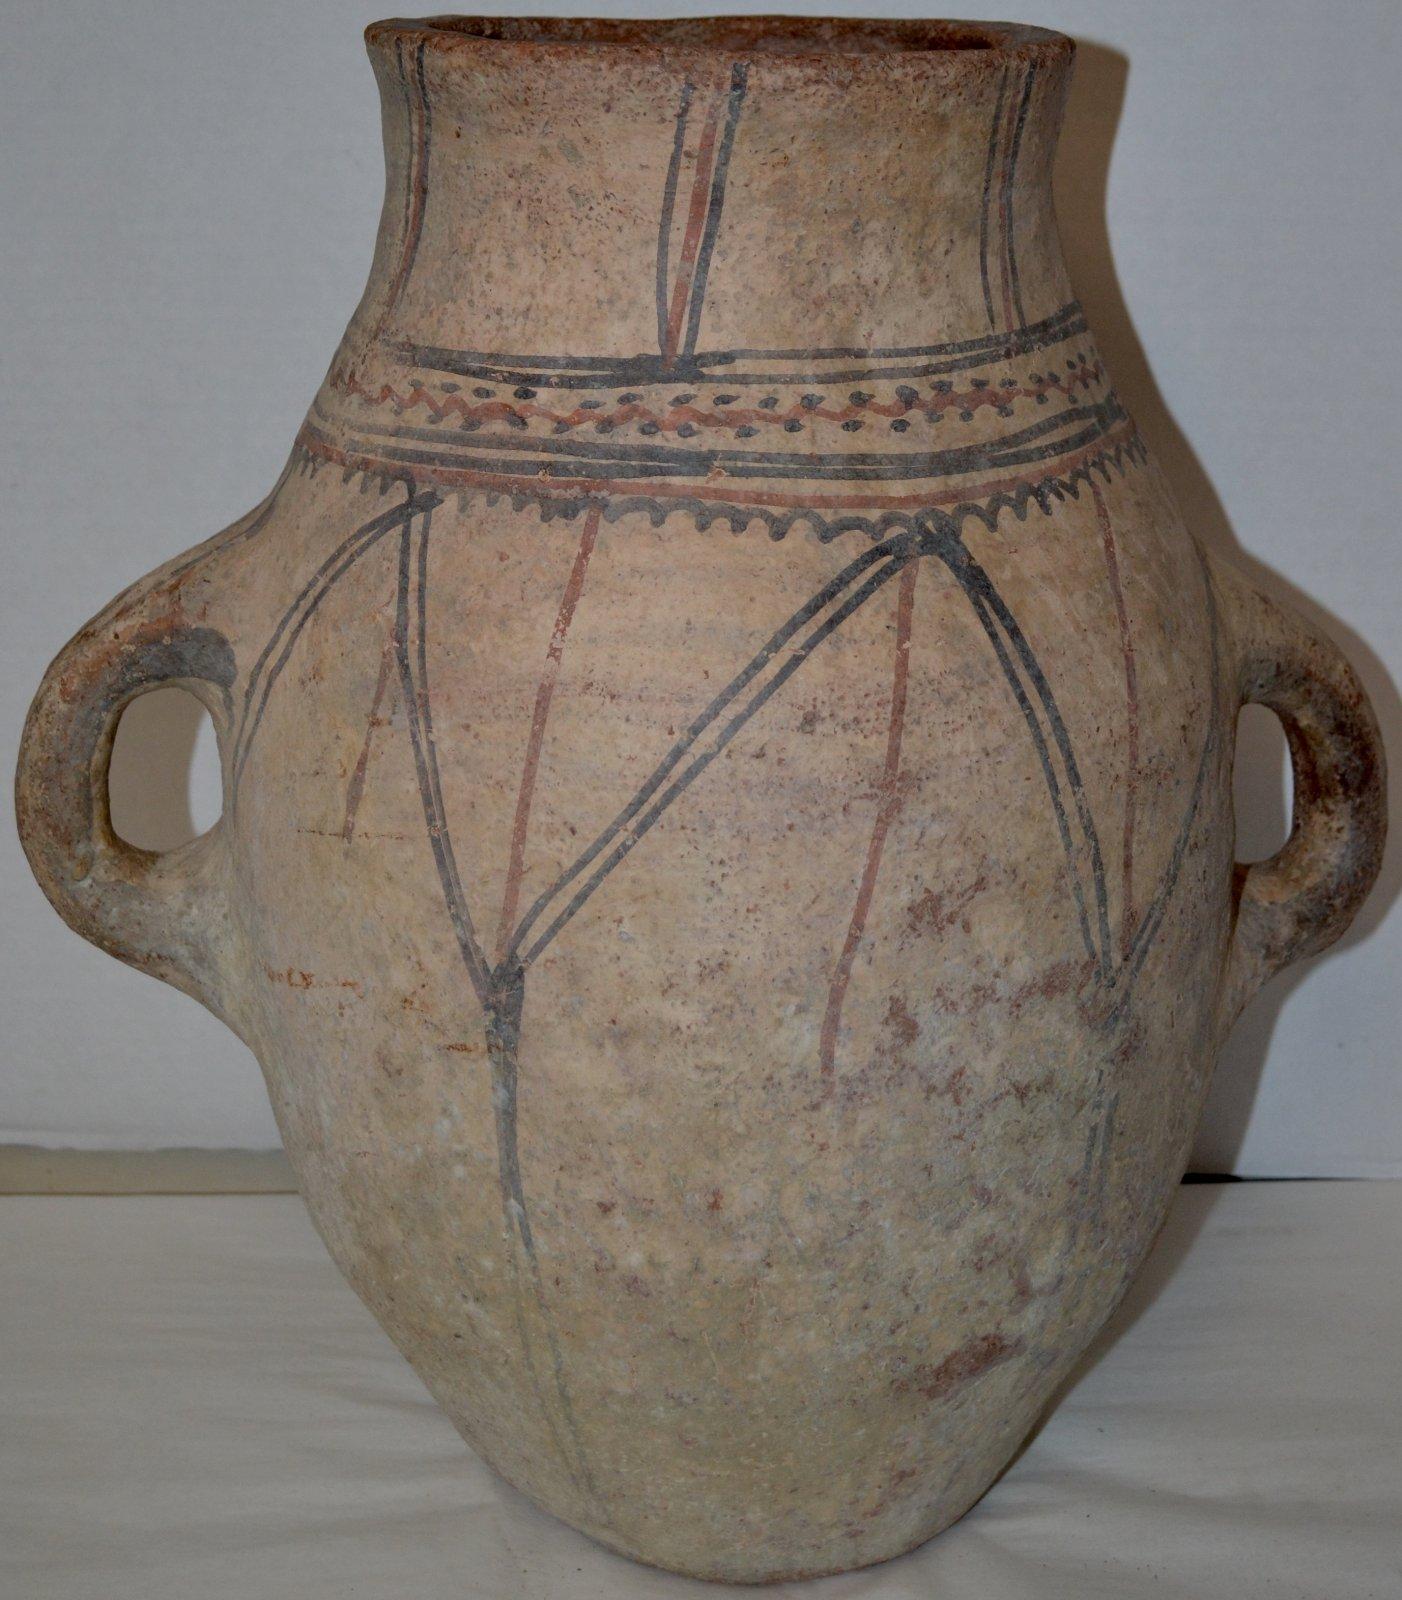 19th Century African Moroccan Vase